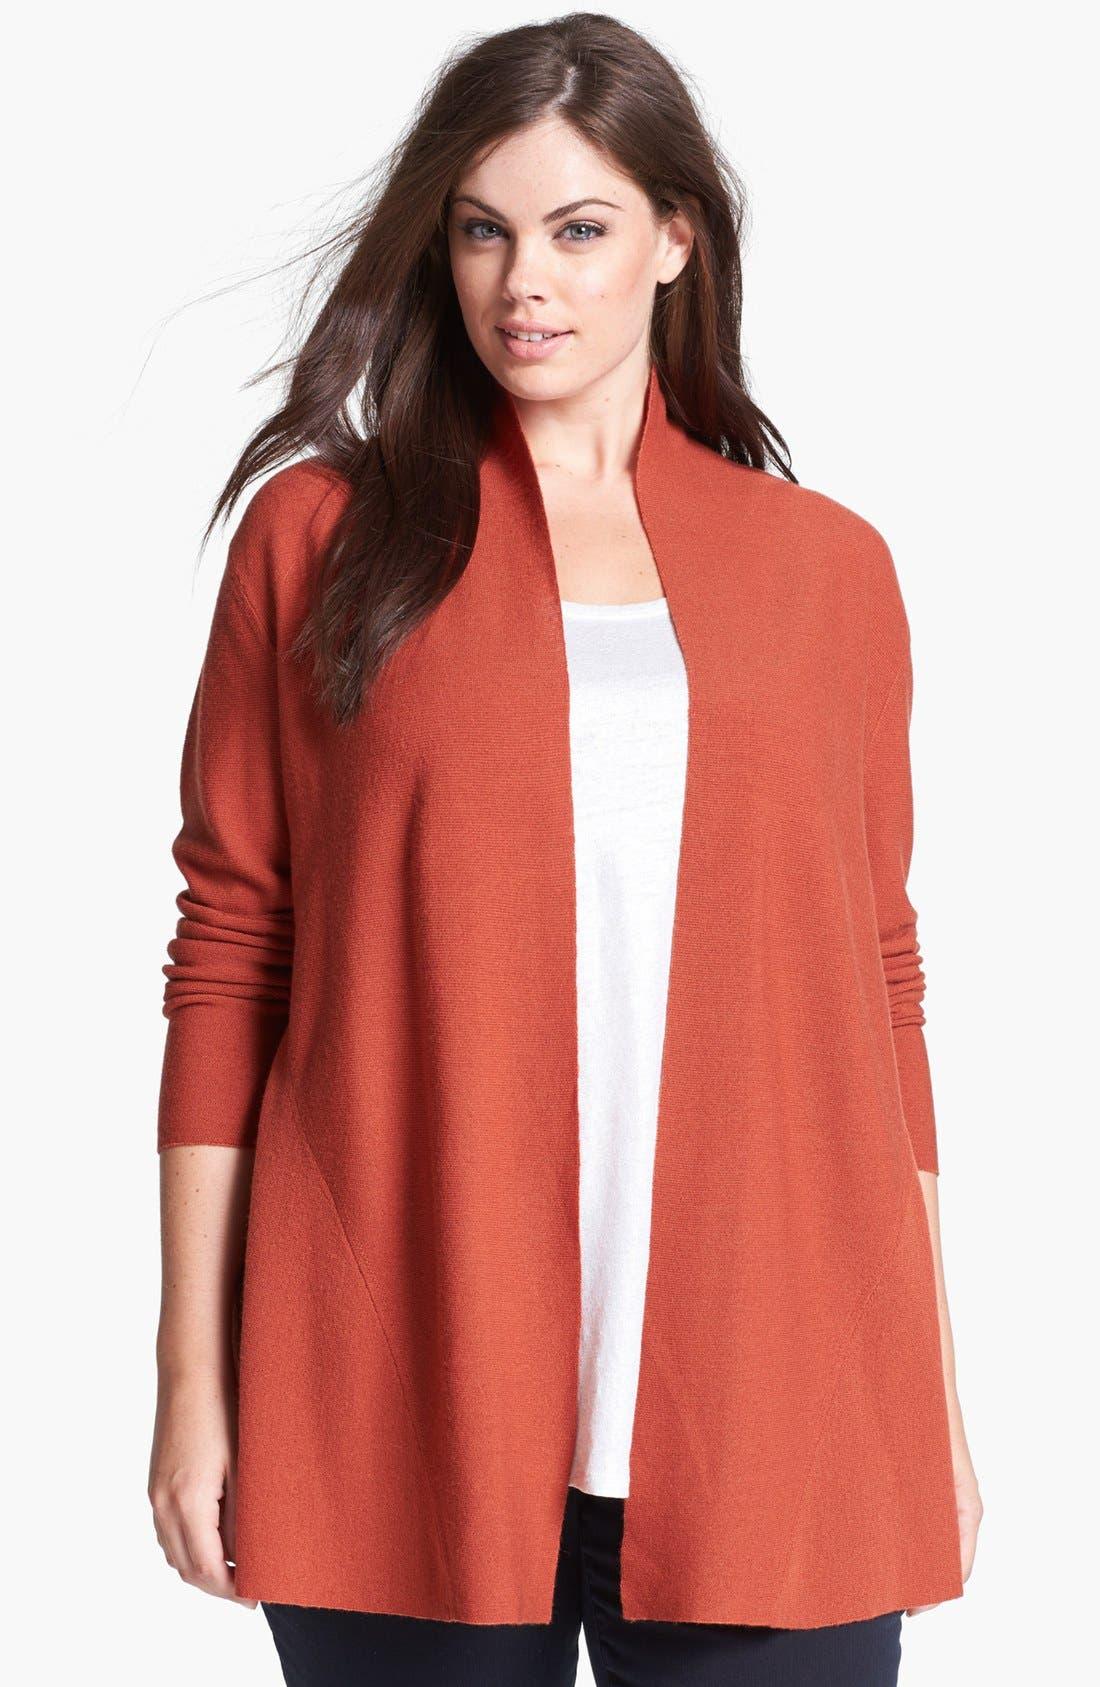 Alternate Image 1 Selected - Eileen Fisher Shaped Merino Wool Cardigan (Plus Size)